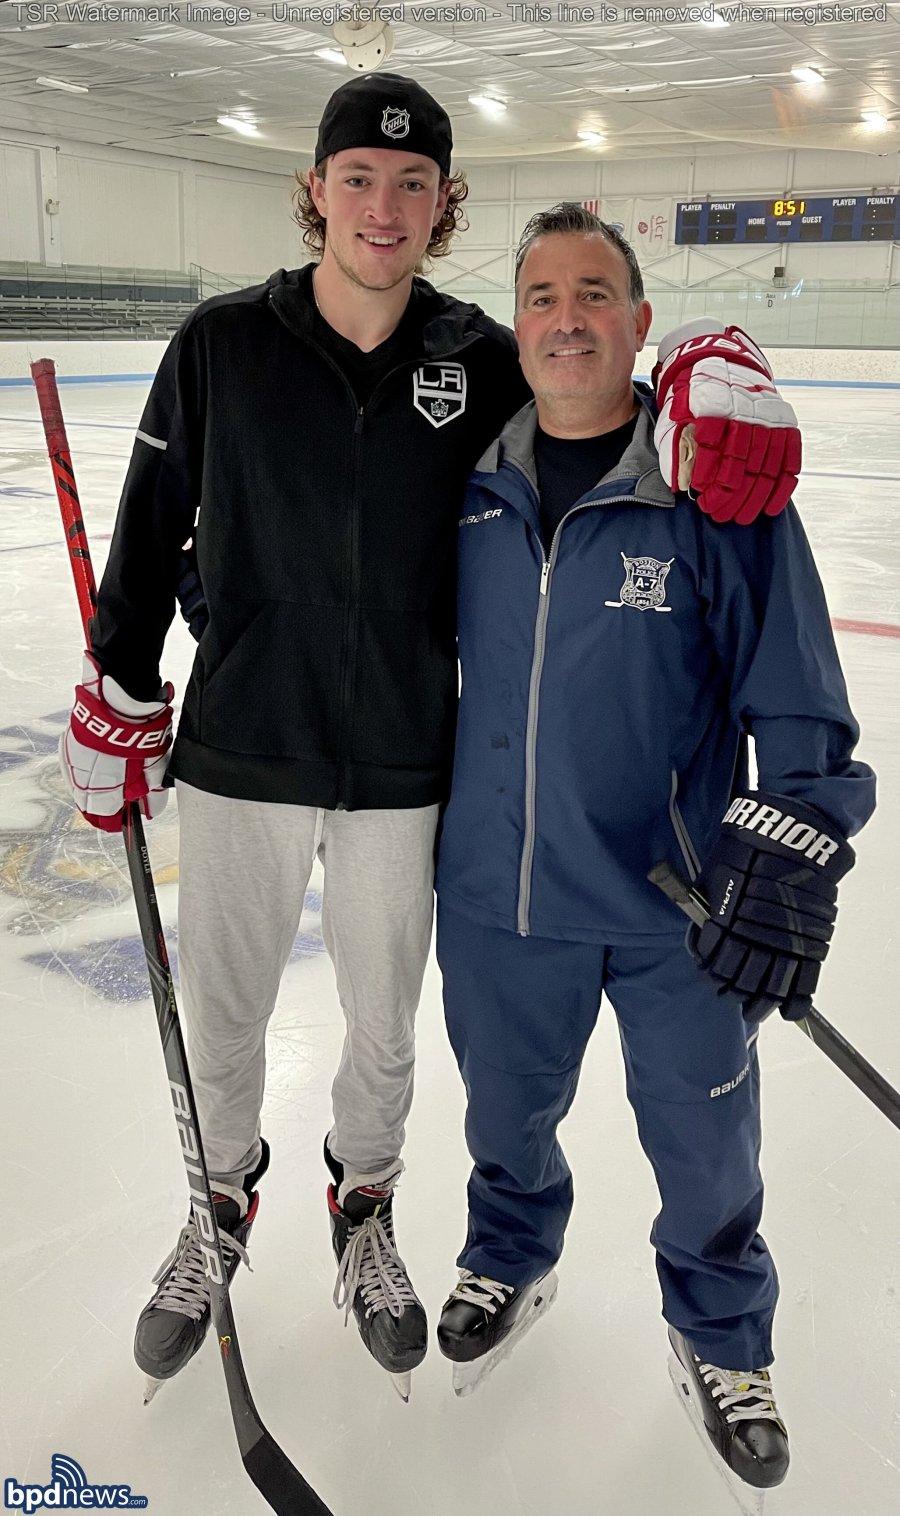 Braden Doyle BPD NHL.jpg